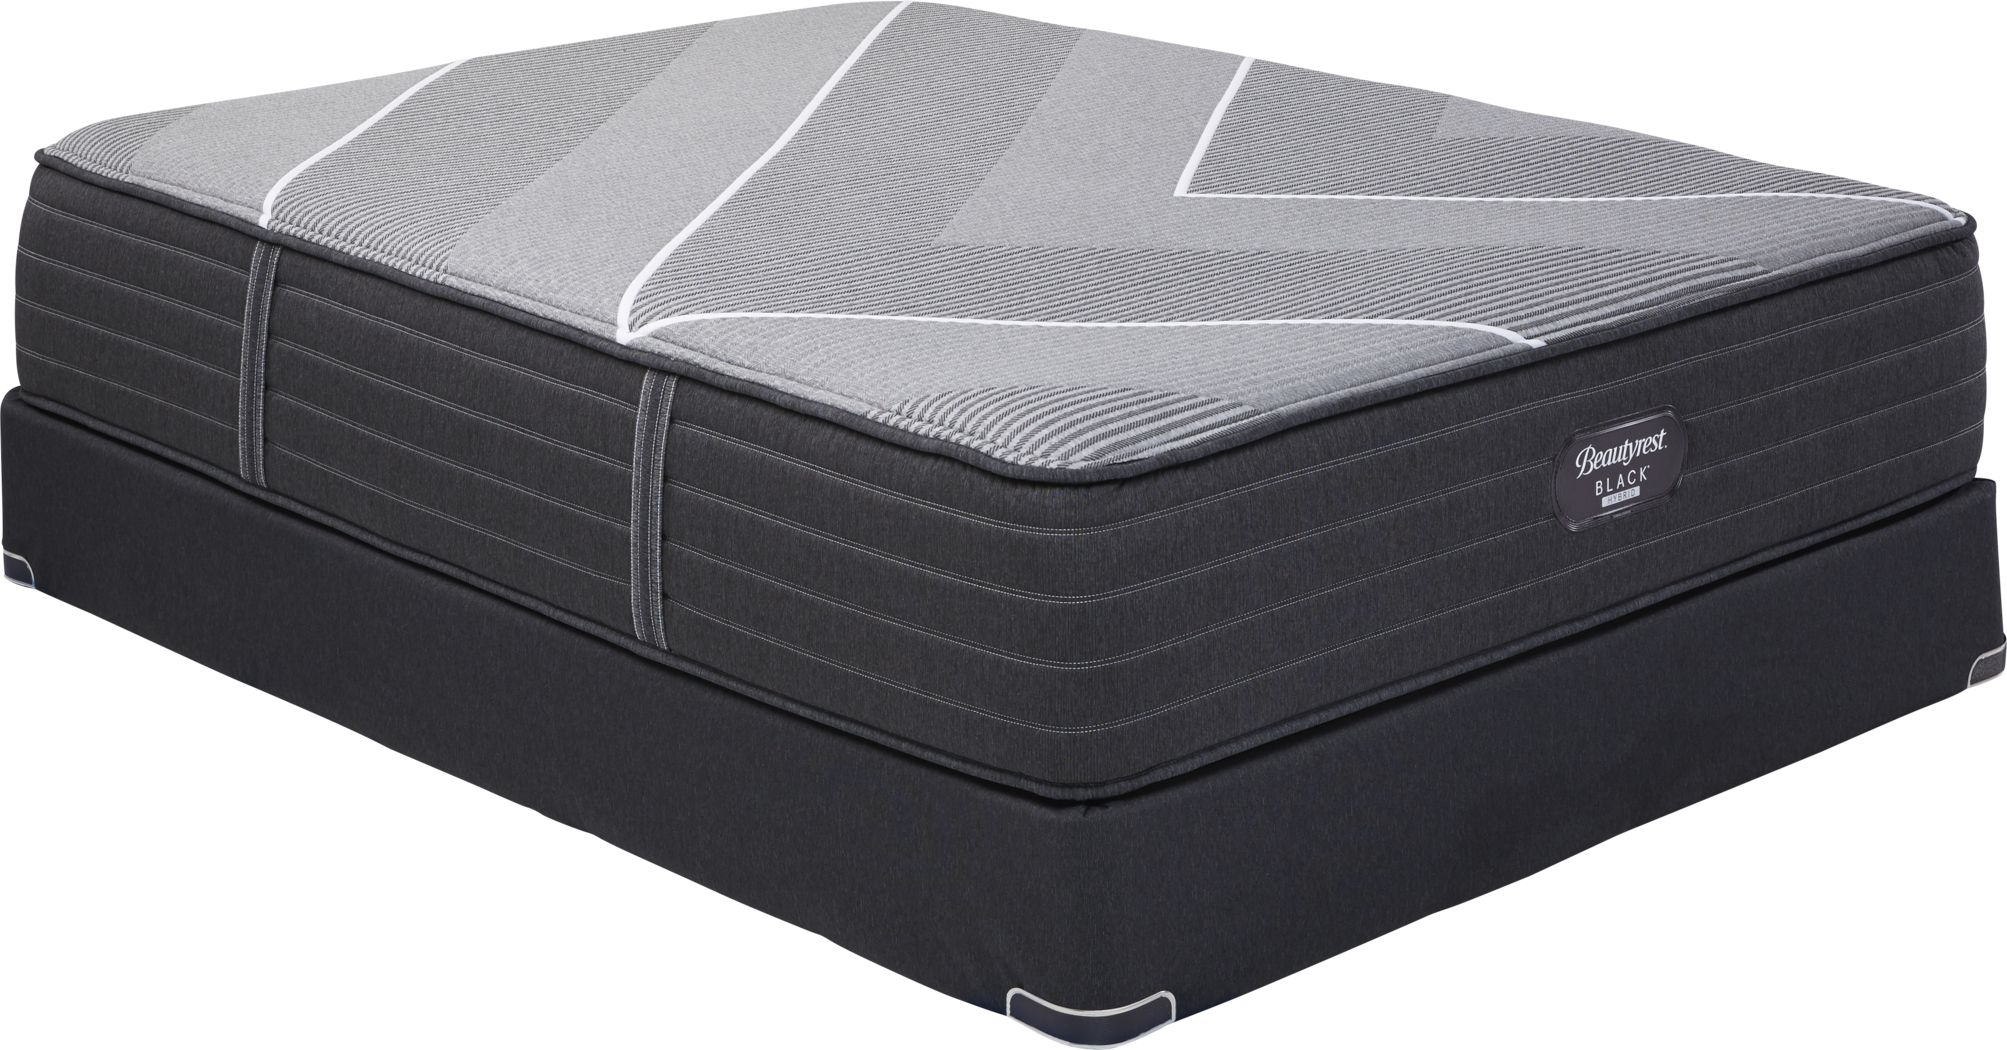 Beautyrest Black Hybrid X-Class Plush Low Profile King Mattress Set